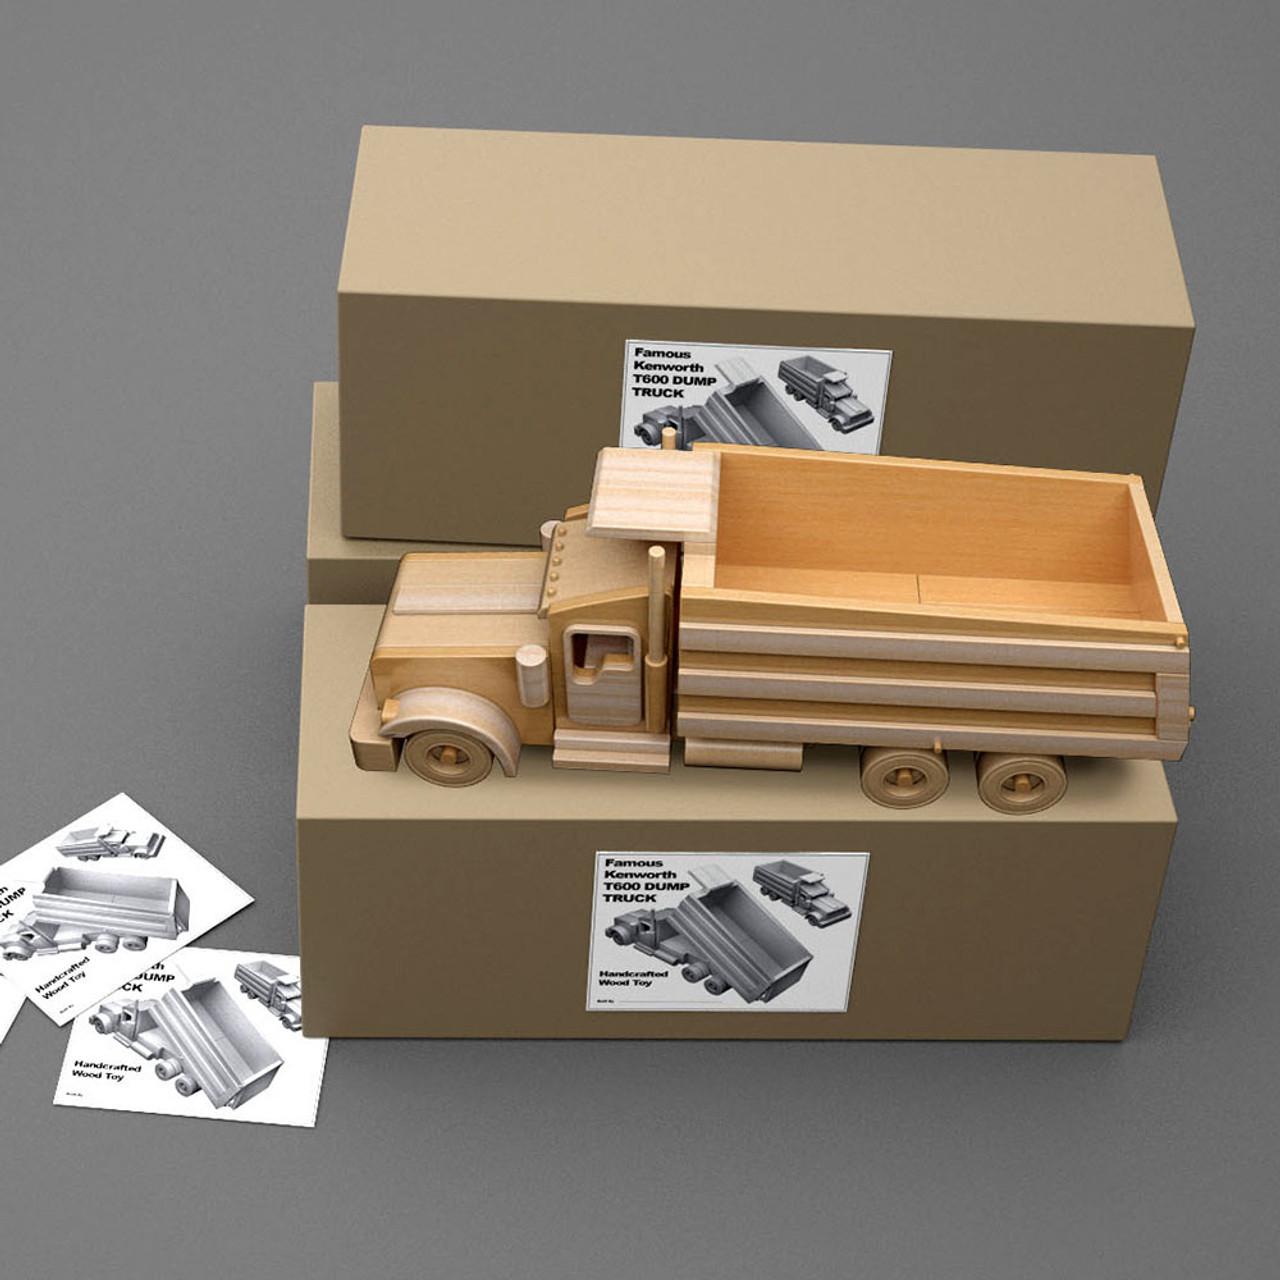 famous kenworth t600 dump truck wood toy plans (pdf download)